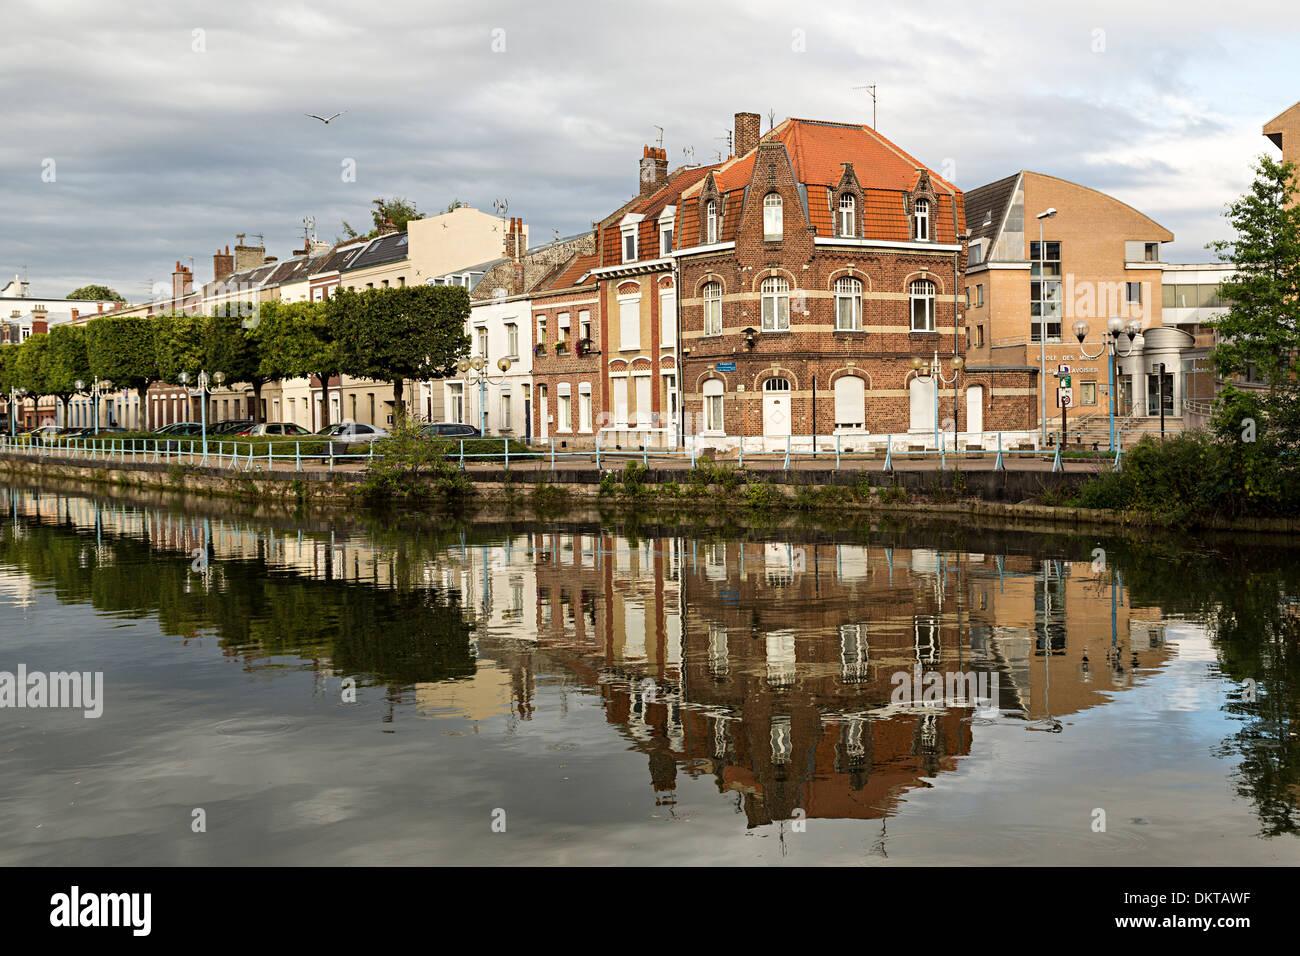 Houses alongside the canal river at Douai, Nord-Pas-de-Calais, France - Stock Image